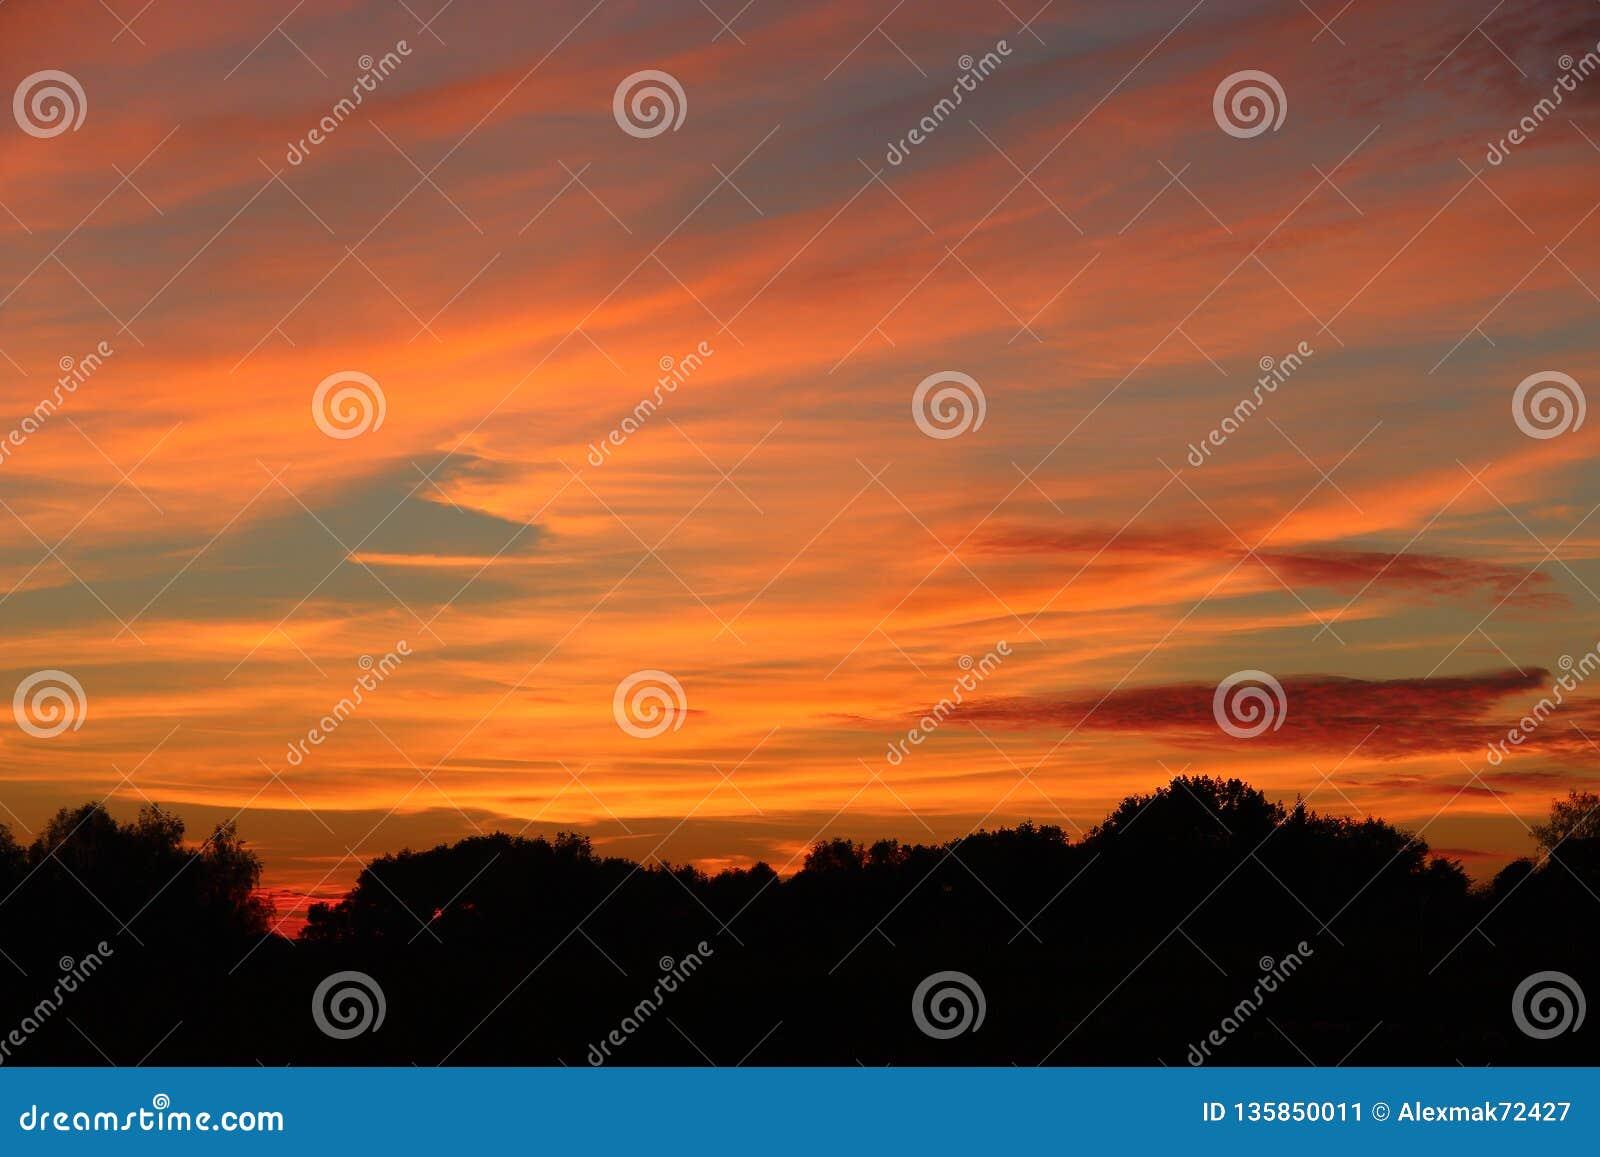 Orange sunset over trees. Twilight with bright sunset. Evening landscape